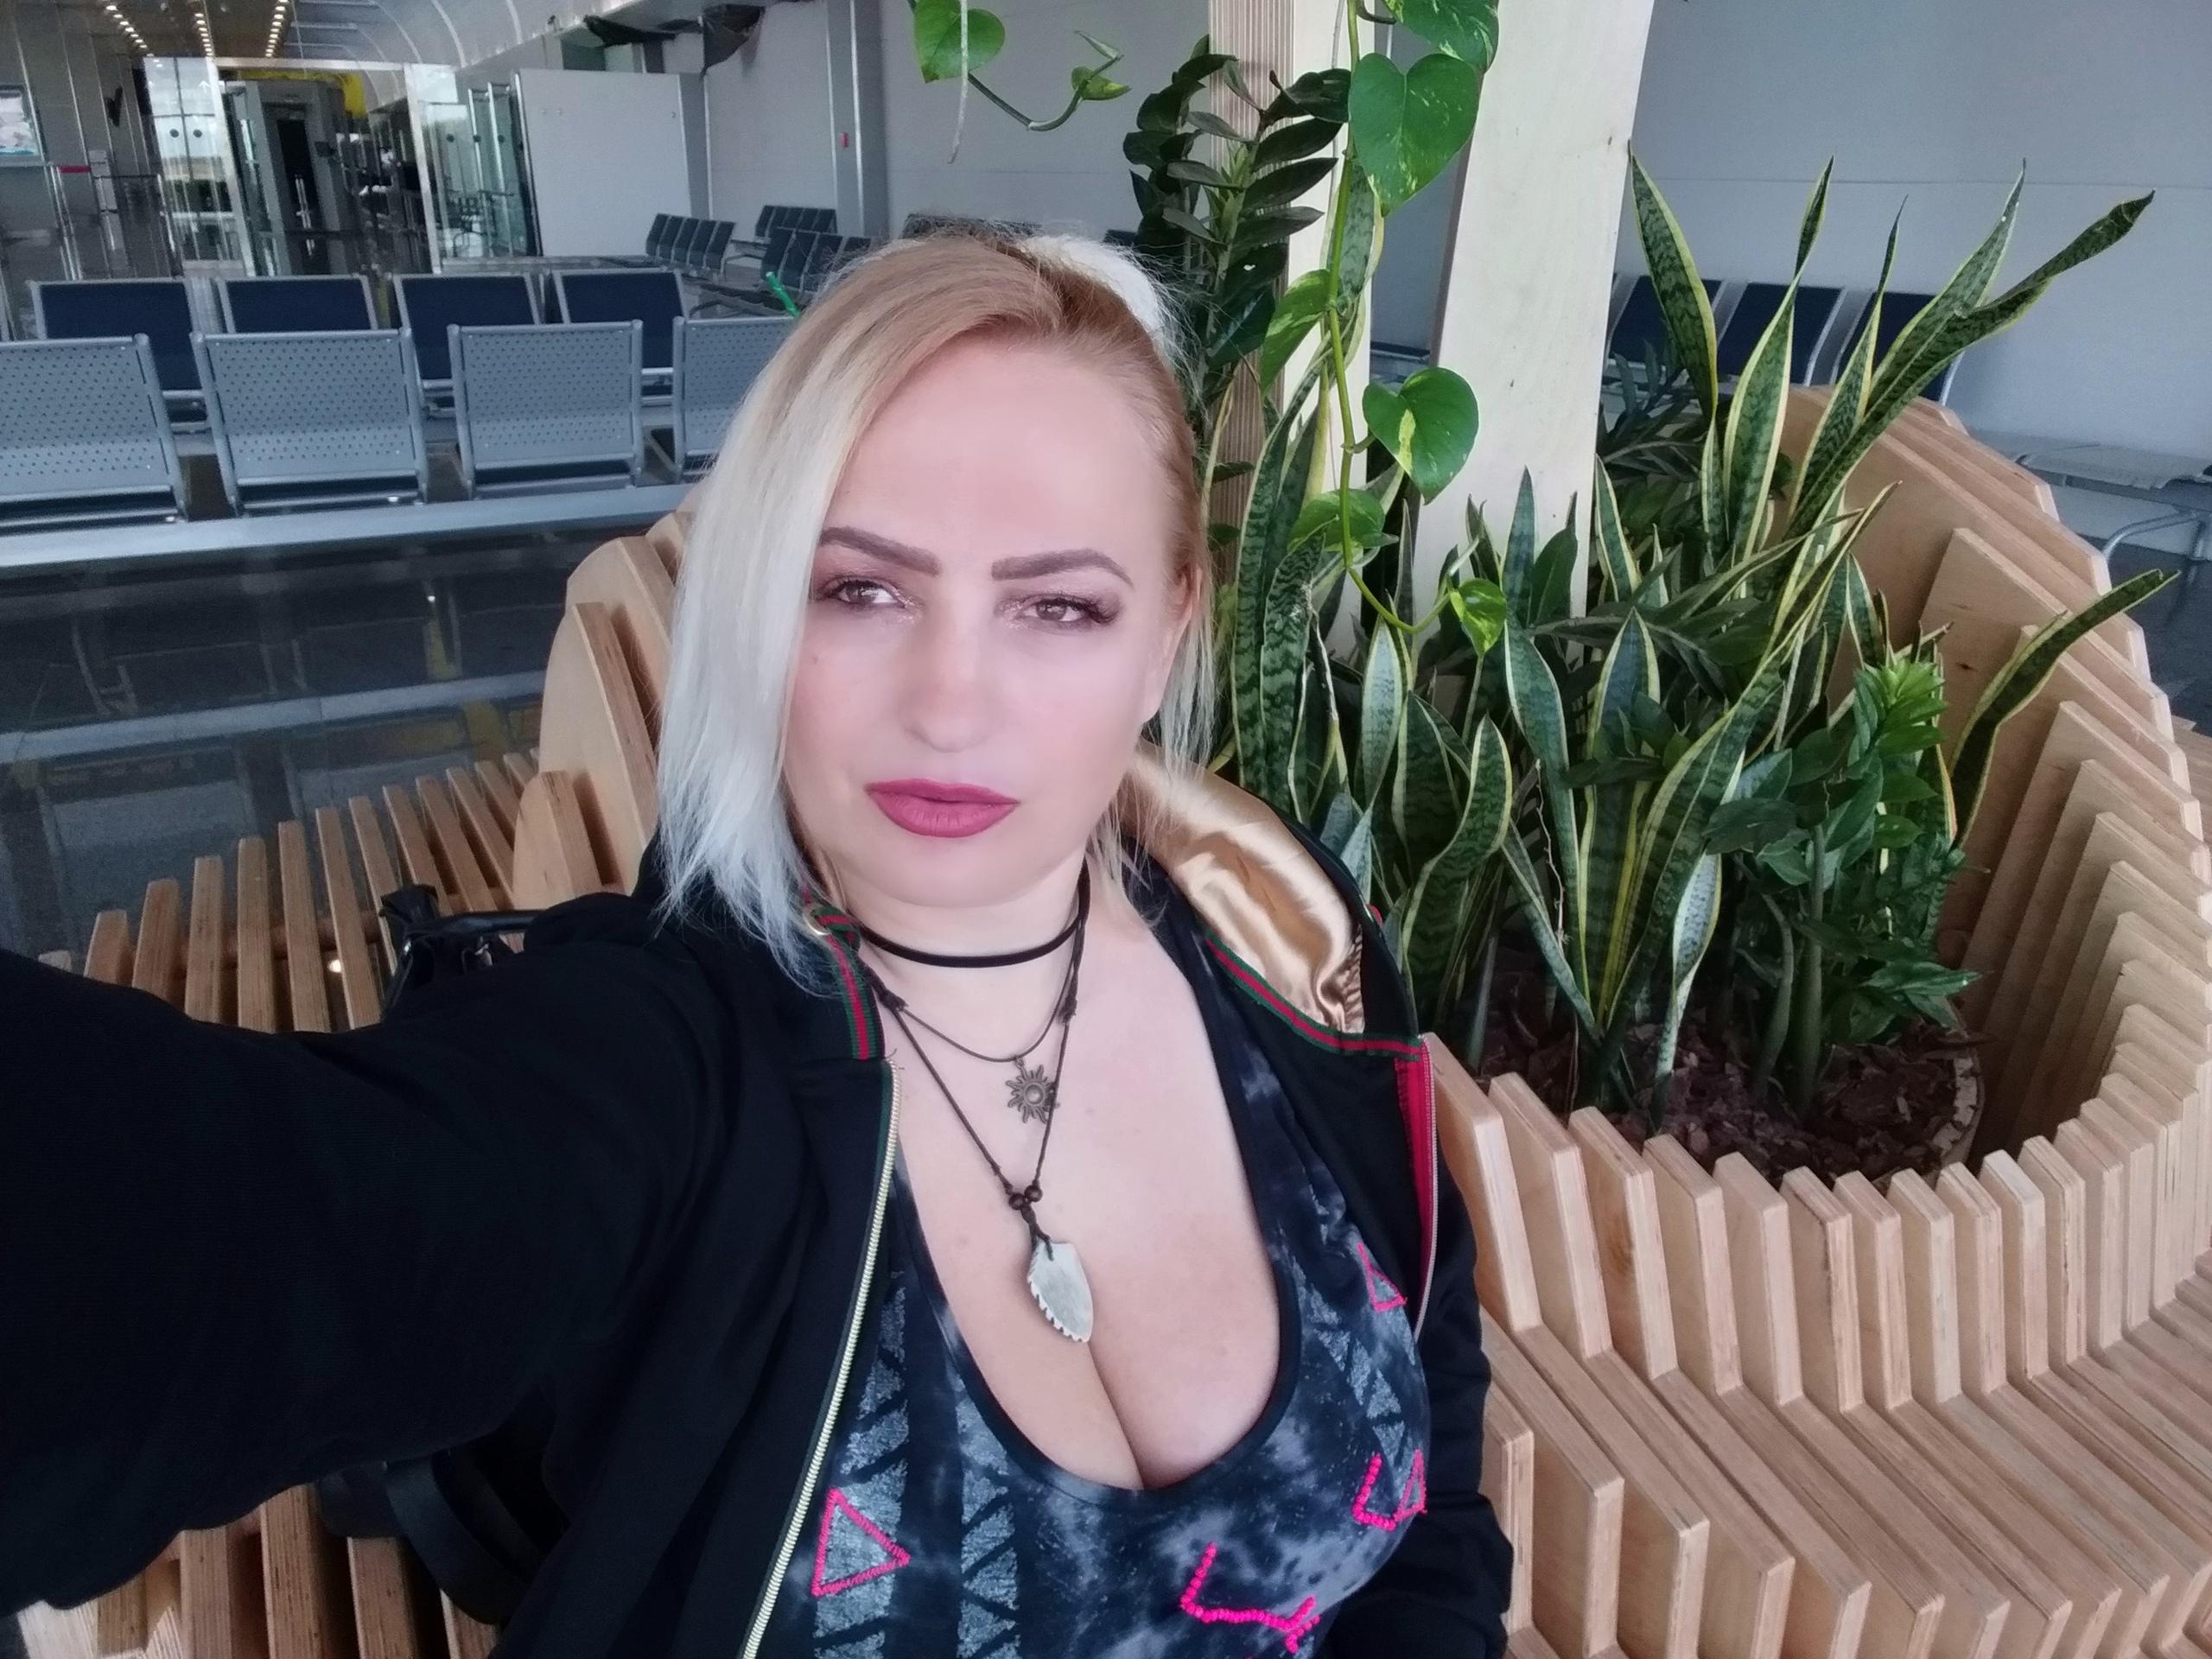 Елена Руденко (Валтея). Мои путешествия. Таиланд ( 2019 г. осень) ФОТО. 9yzFm71jzec